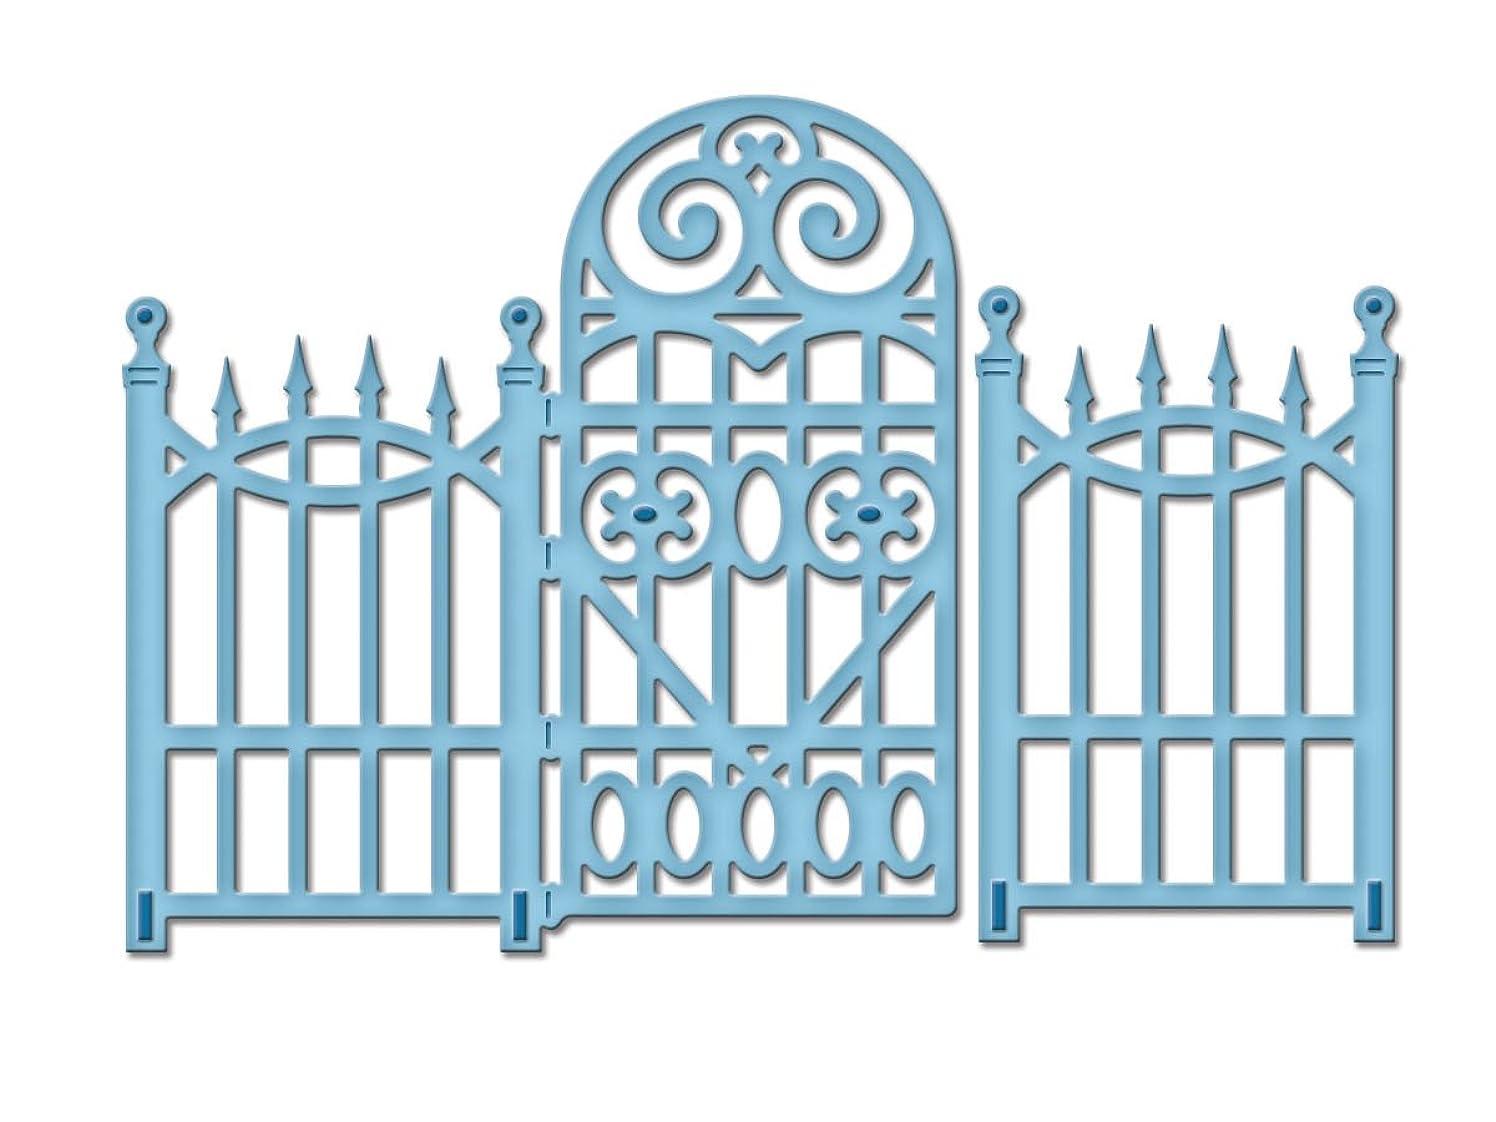 Spellbinders S2-080 Die D-Lites Garden Gate Etched/Wafer Thin Dies